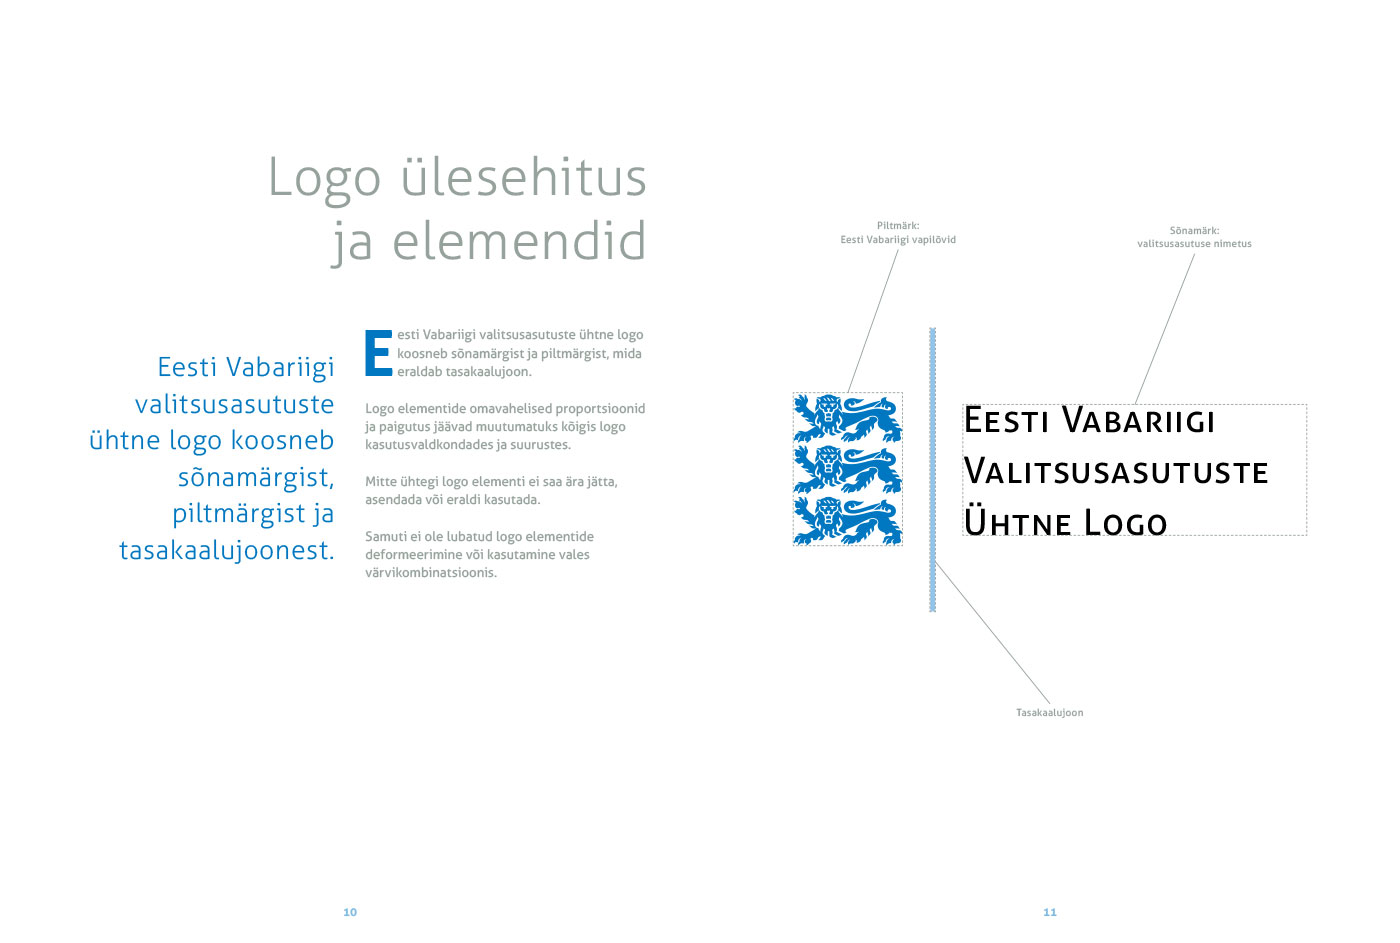 Eesti Vabariigi logo